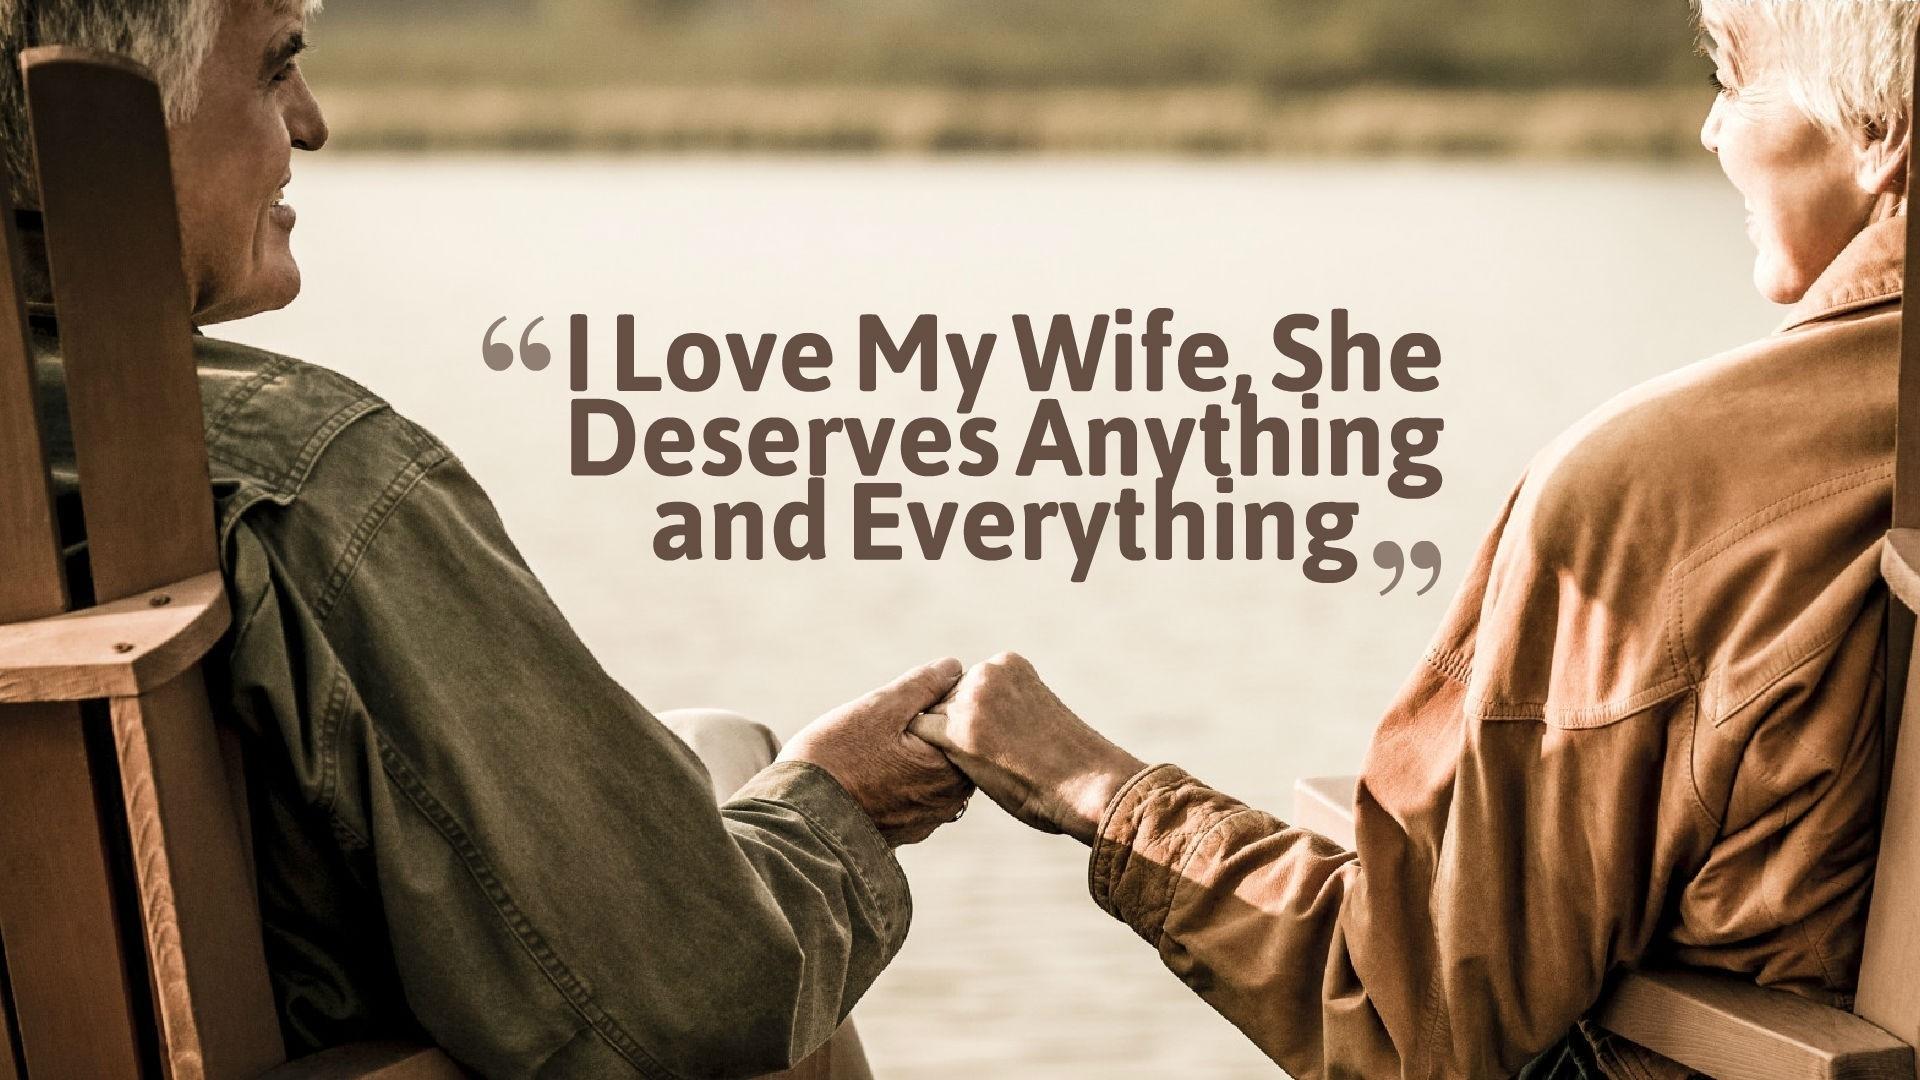 i love my wife anniversary quotes wallpaper 00278 - baltana